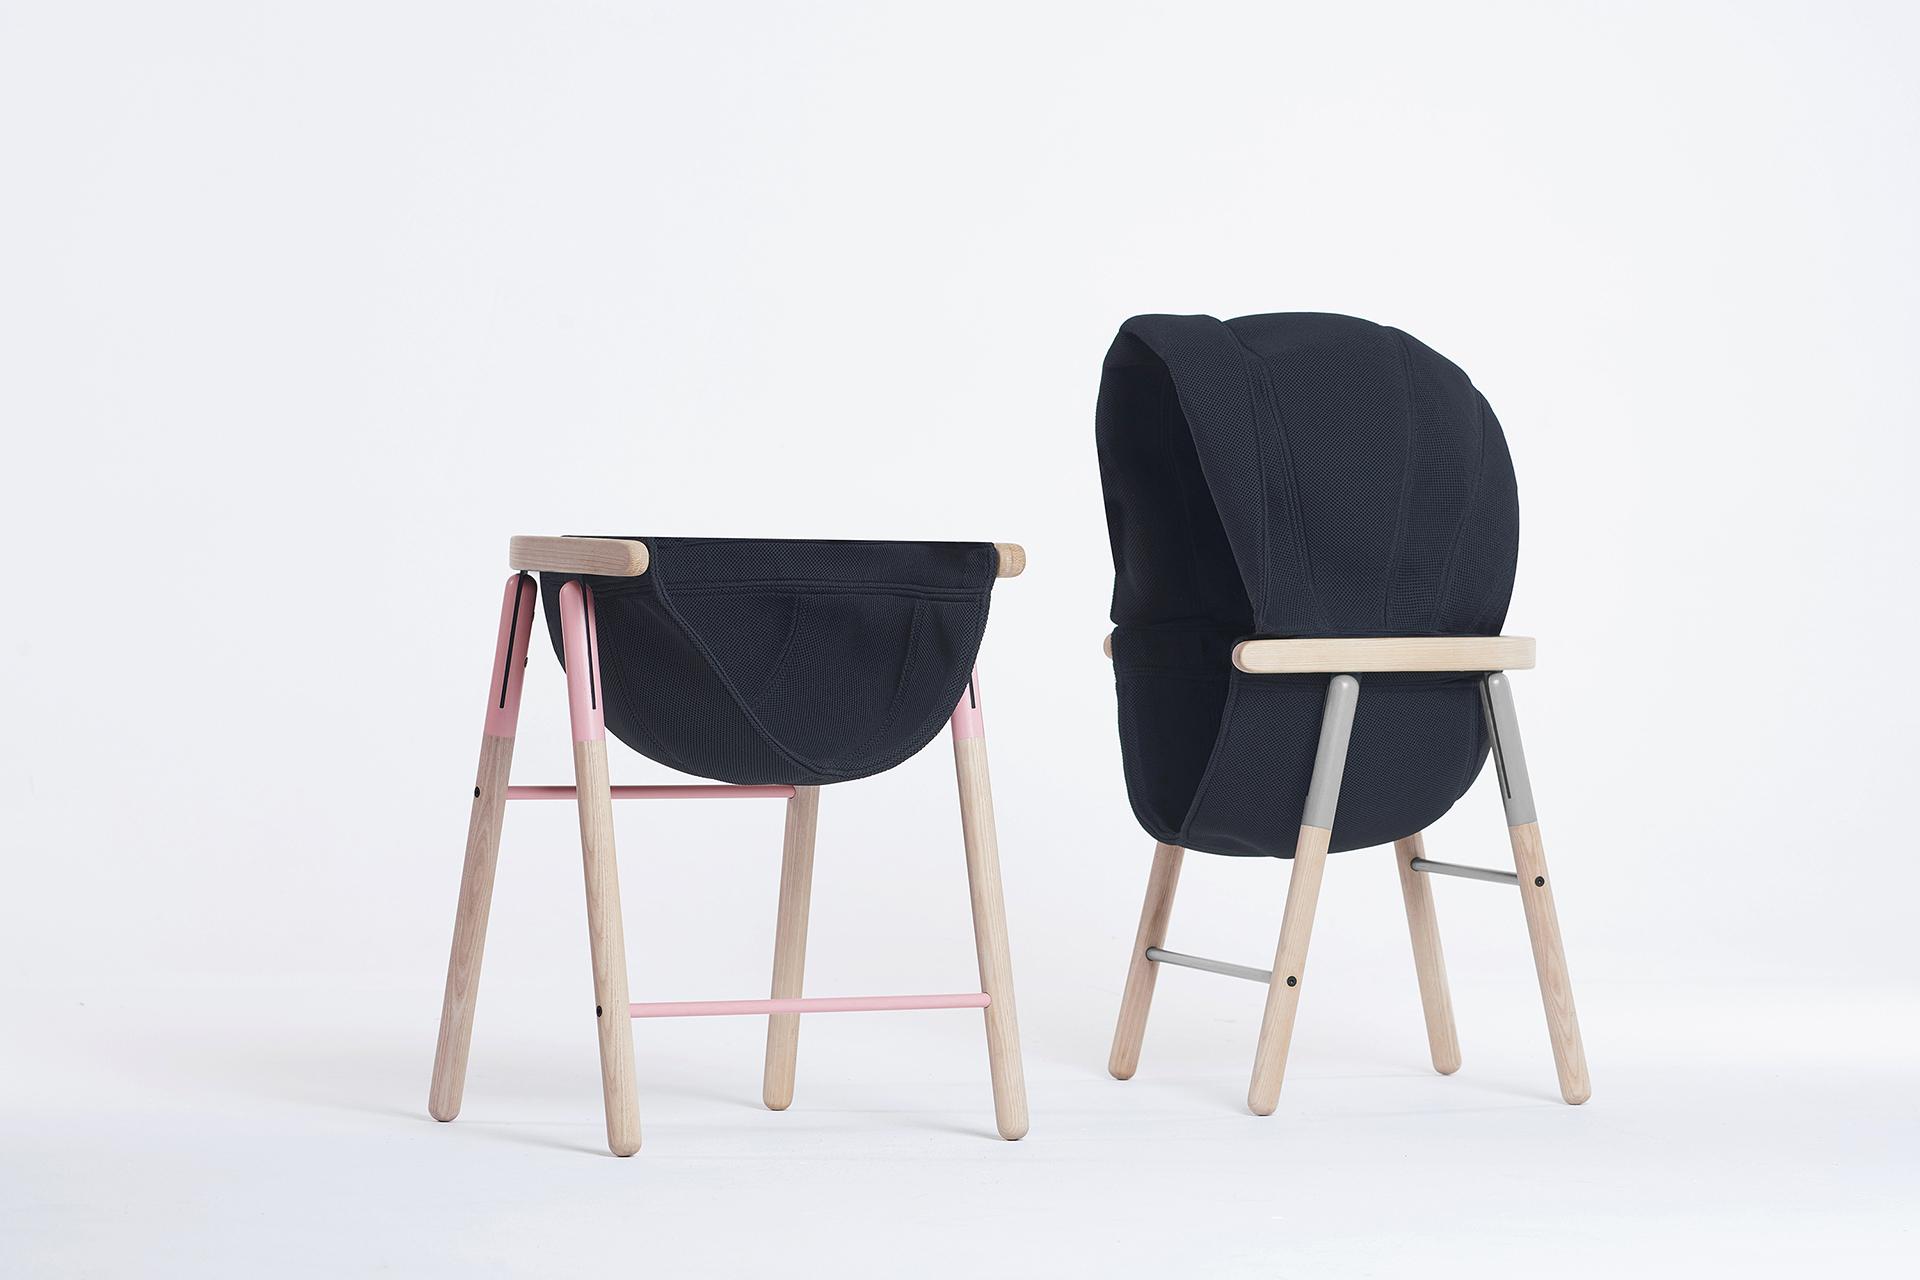 Tink Things sensory furniture 2 (Photo by Marija Gasparovic).jpg